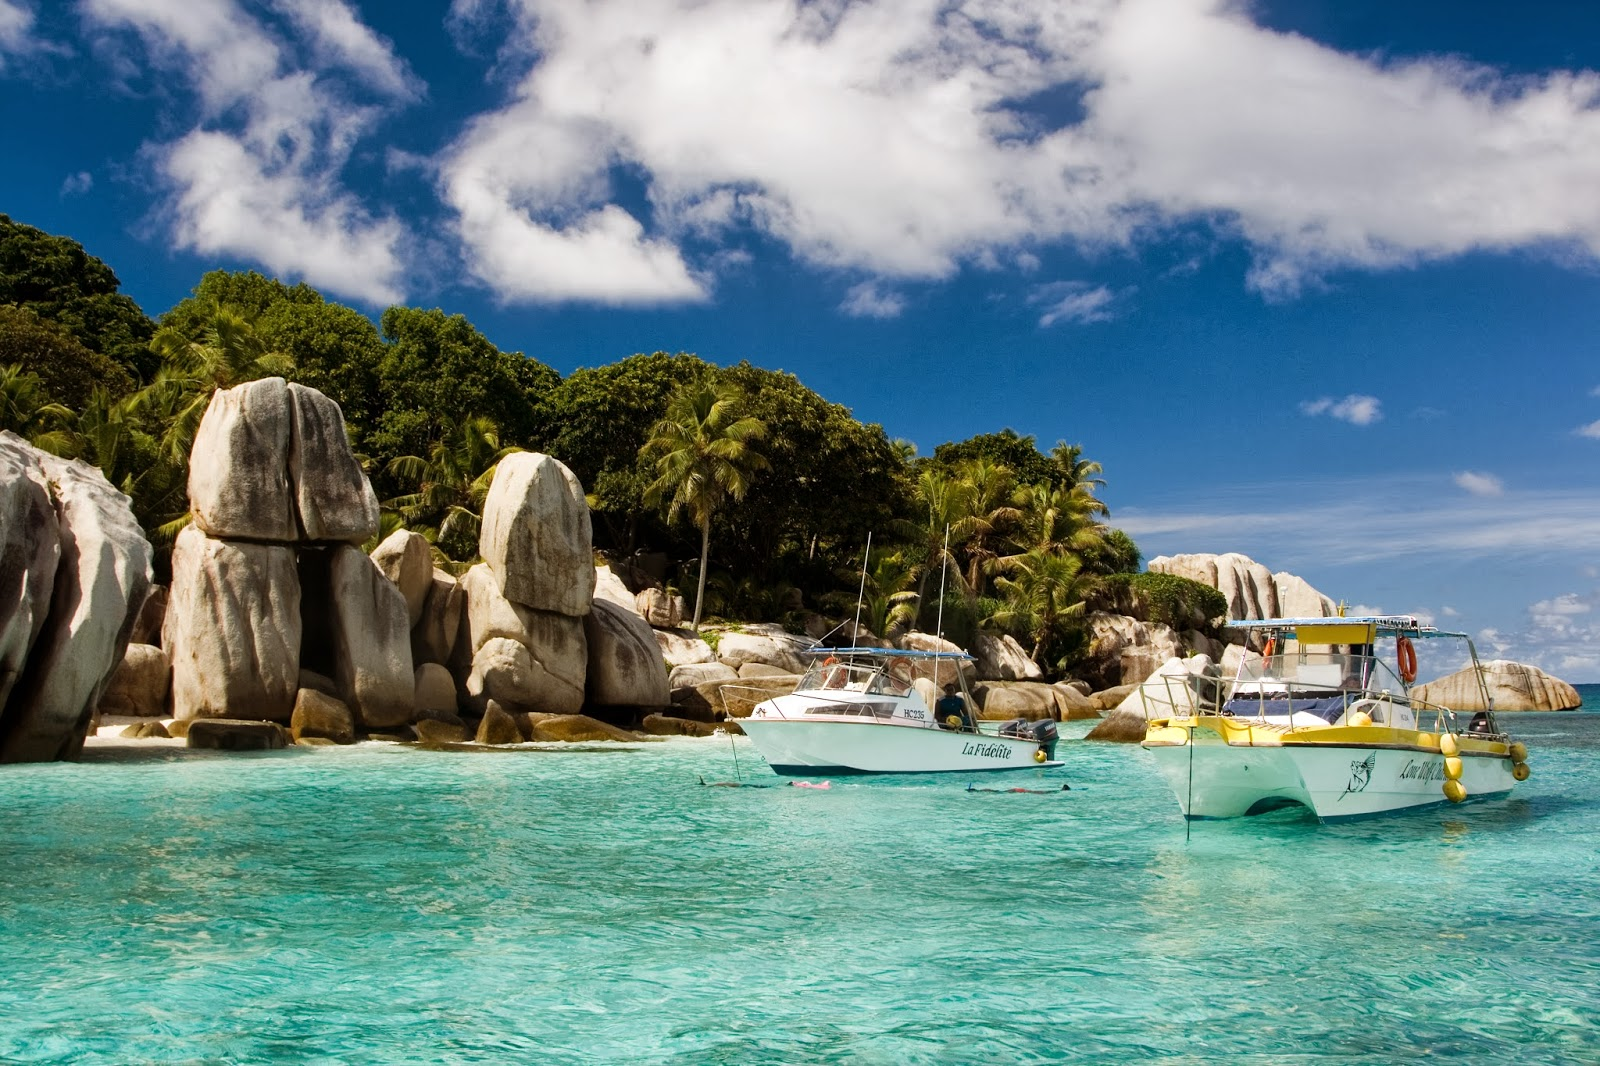 Ilhas Seychelles turismo barato